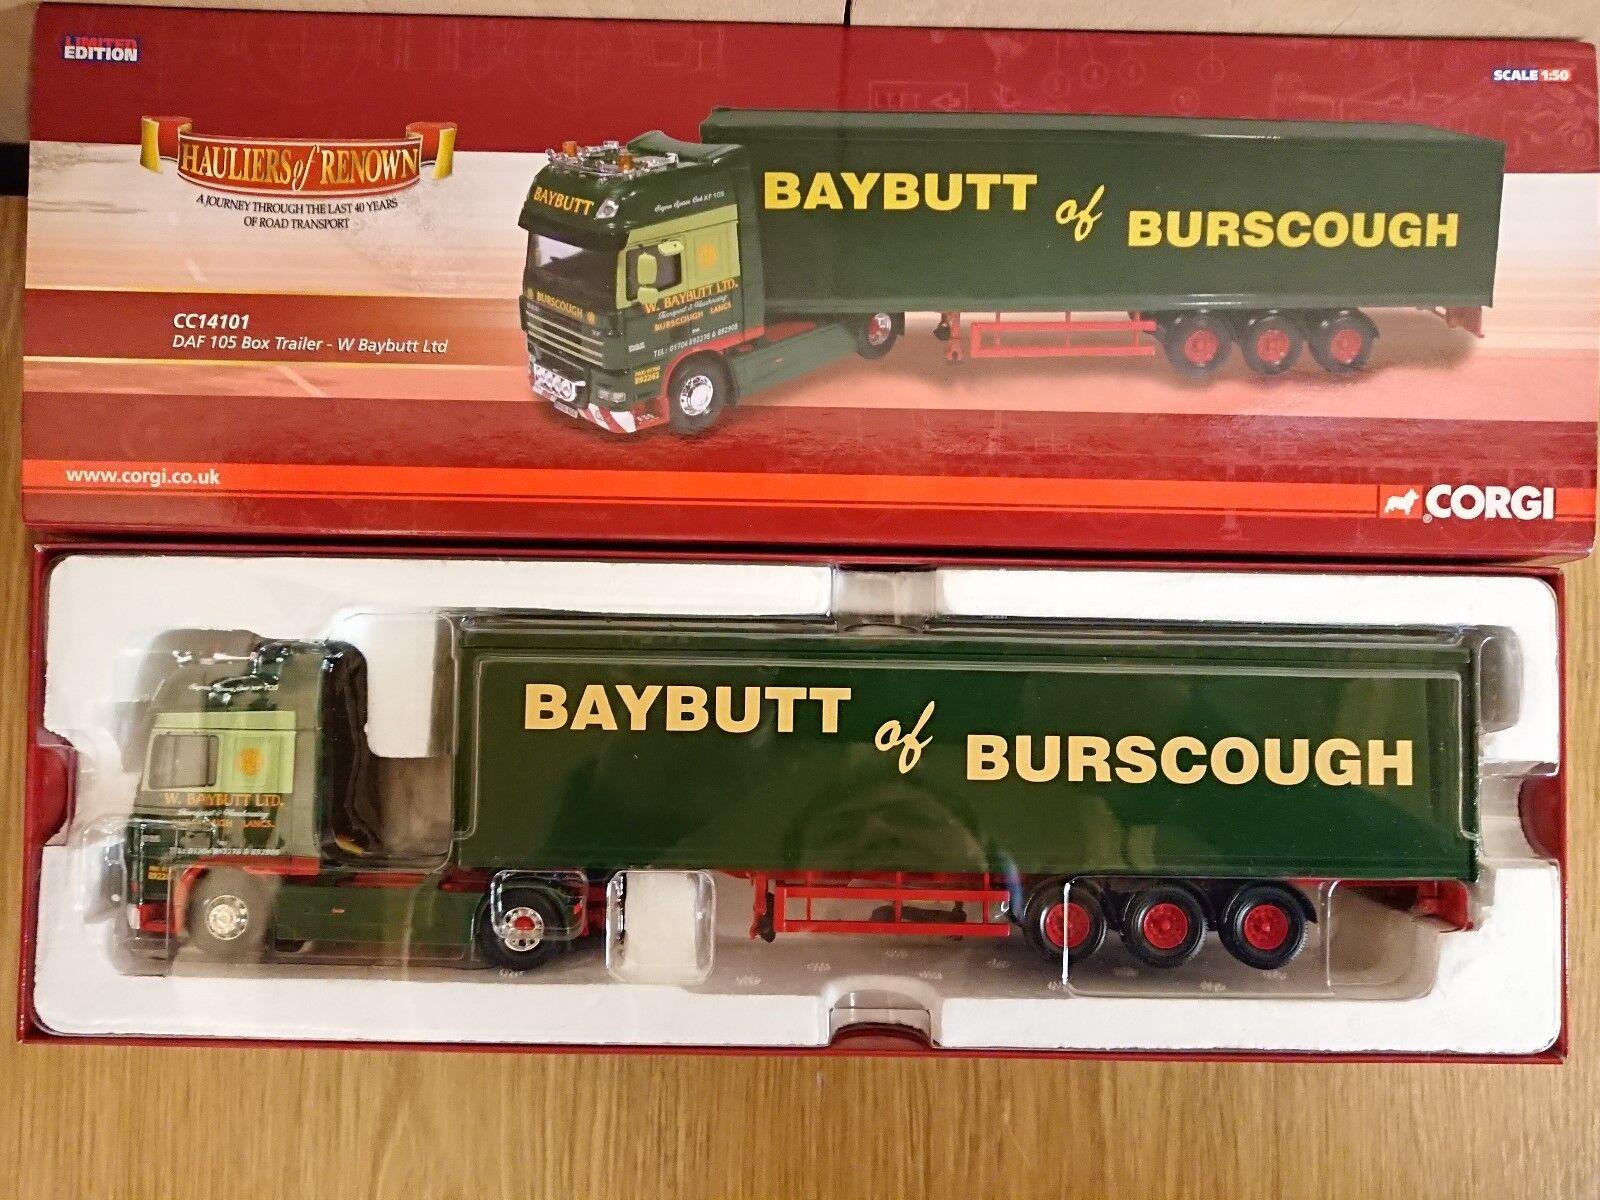 CORGI CC14101 DAF 105 Boîte Remorque W. baybutt Ltd Edition No 0002 de seulement 1610